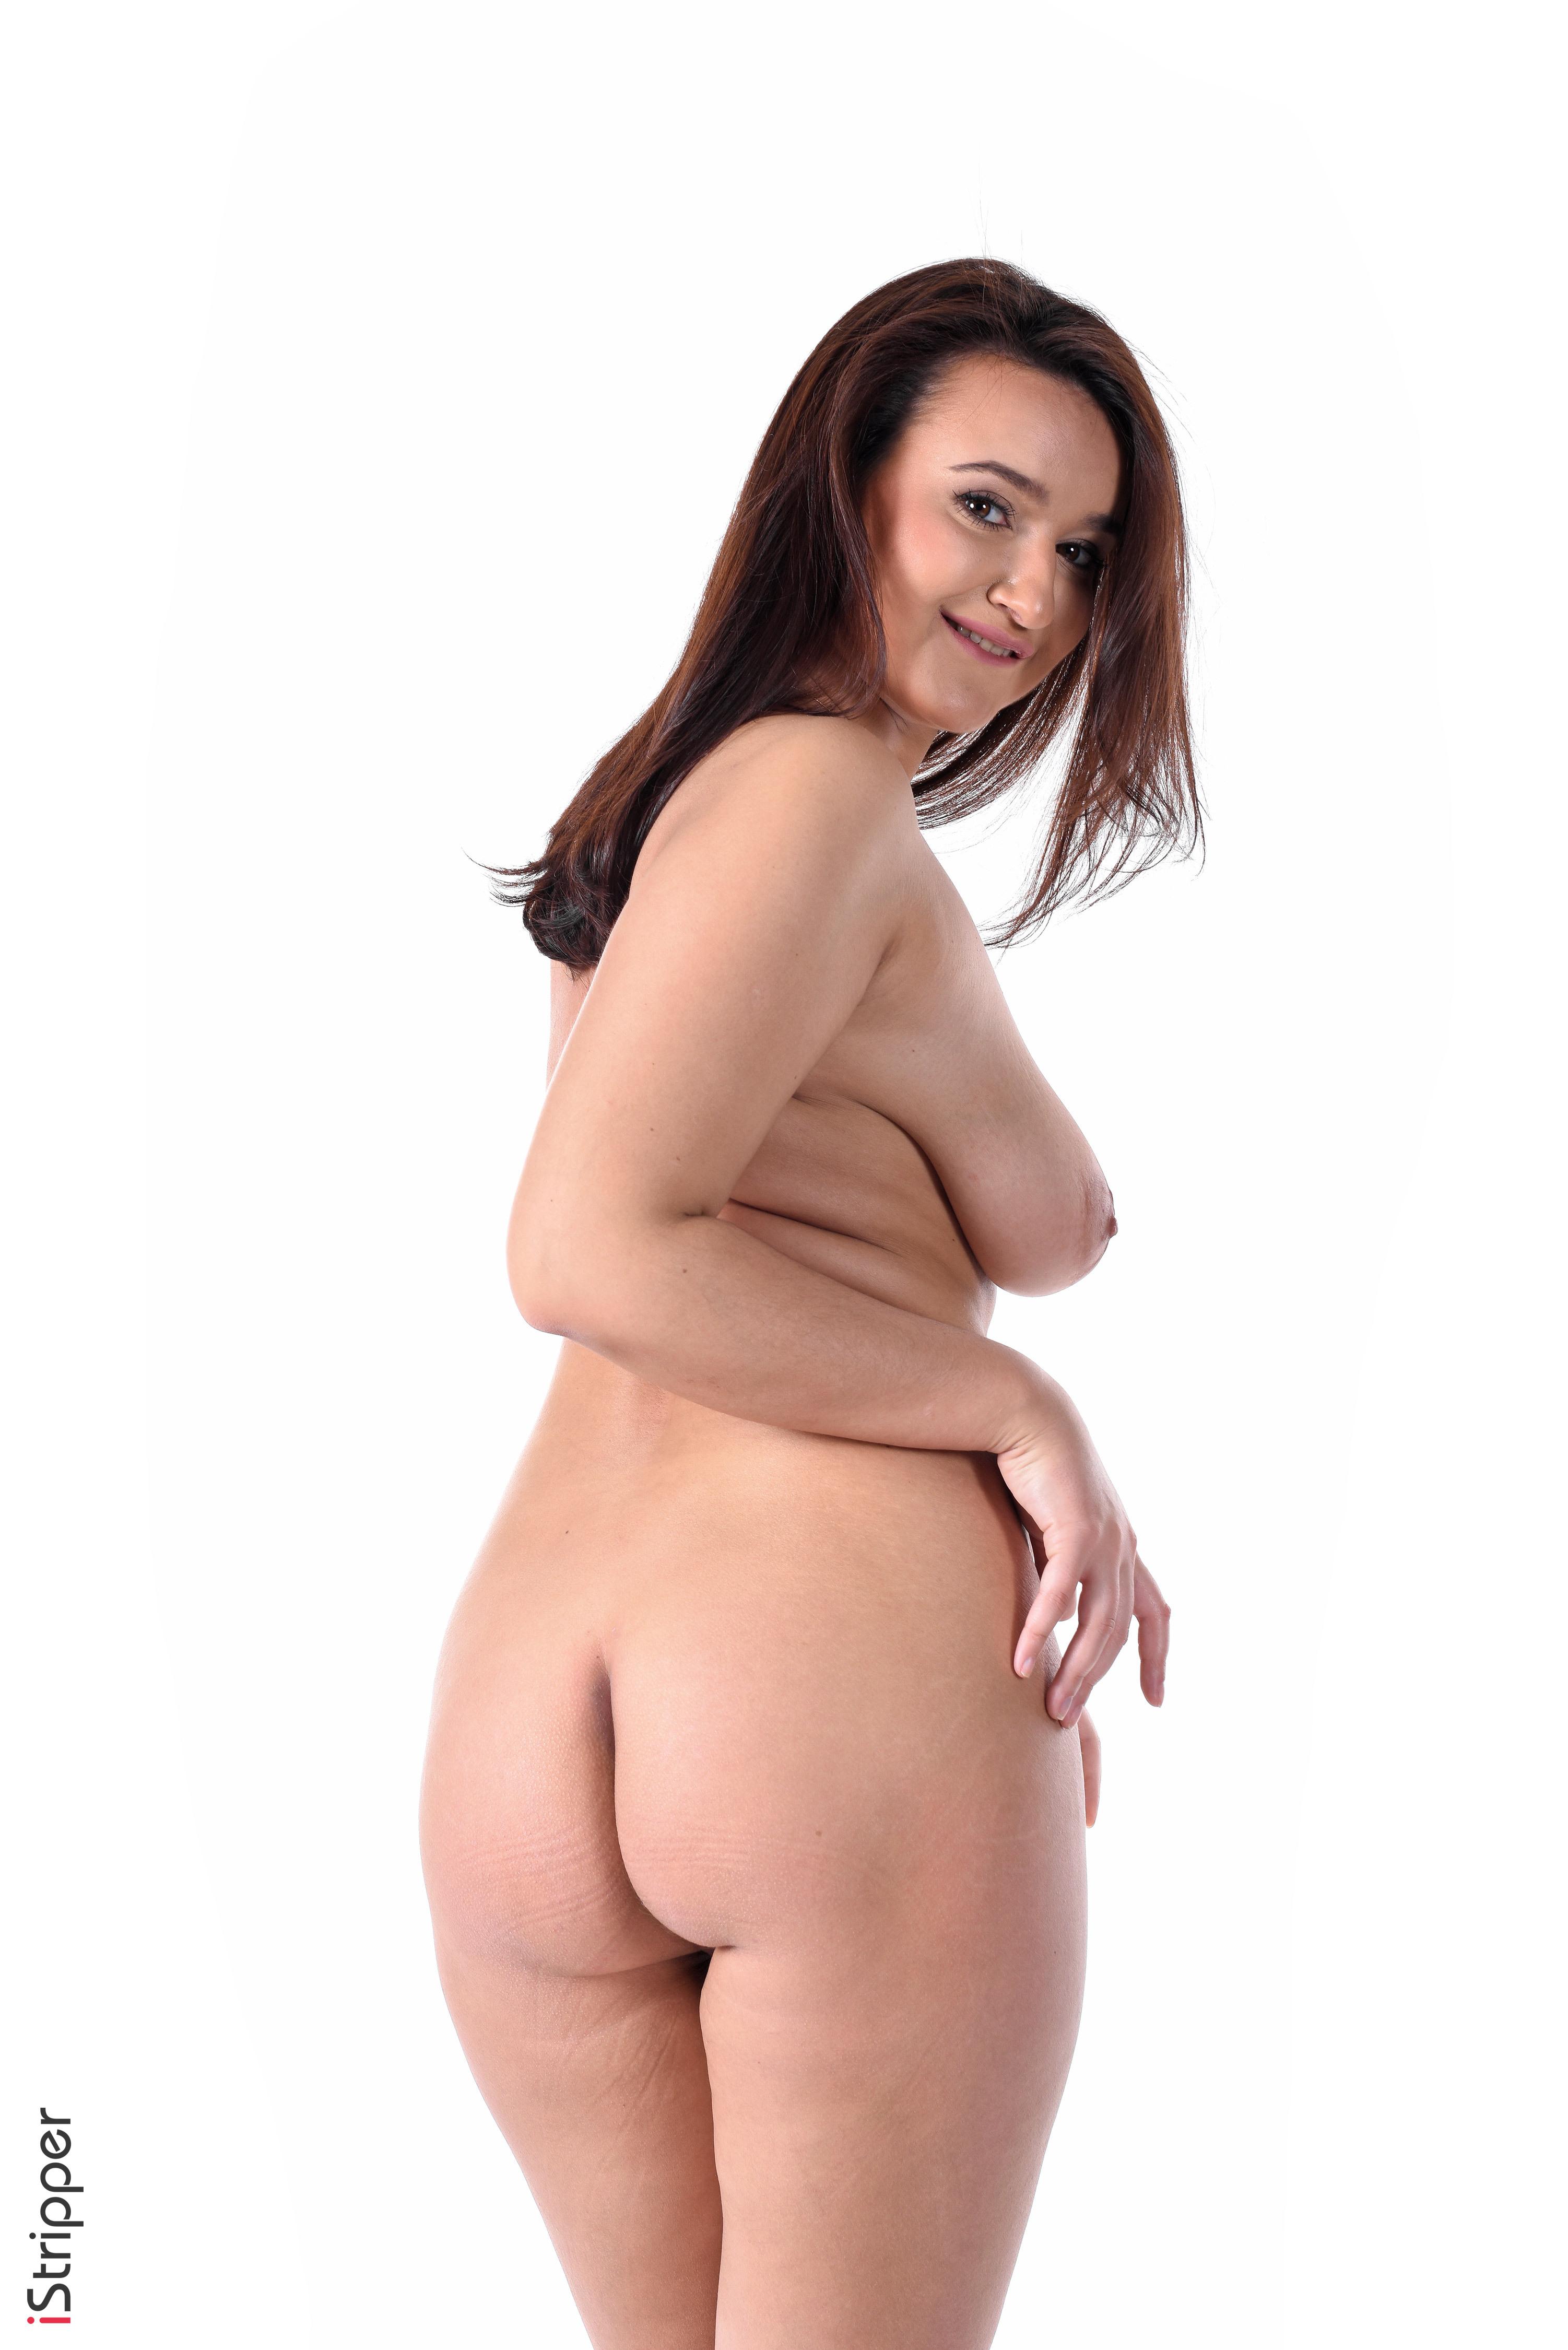 hd erotic nudes